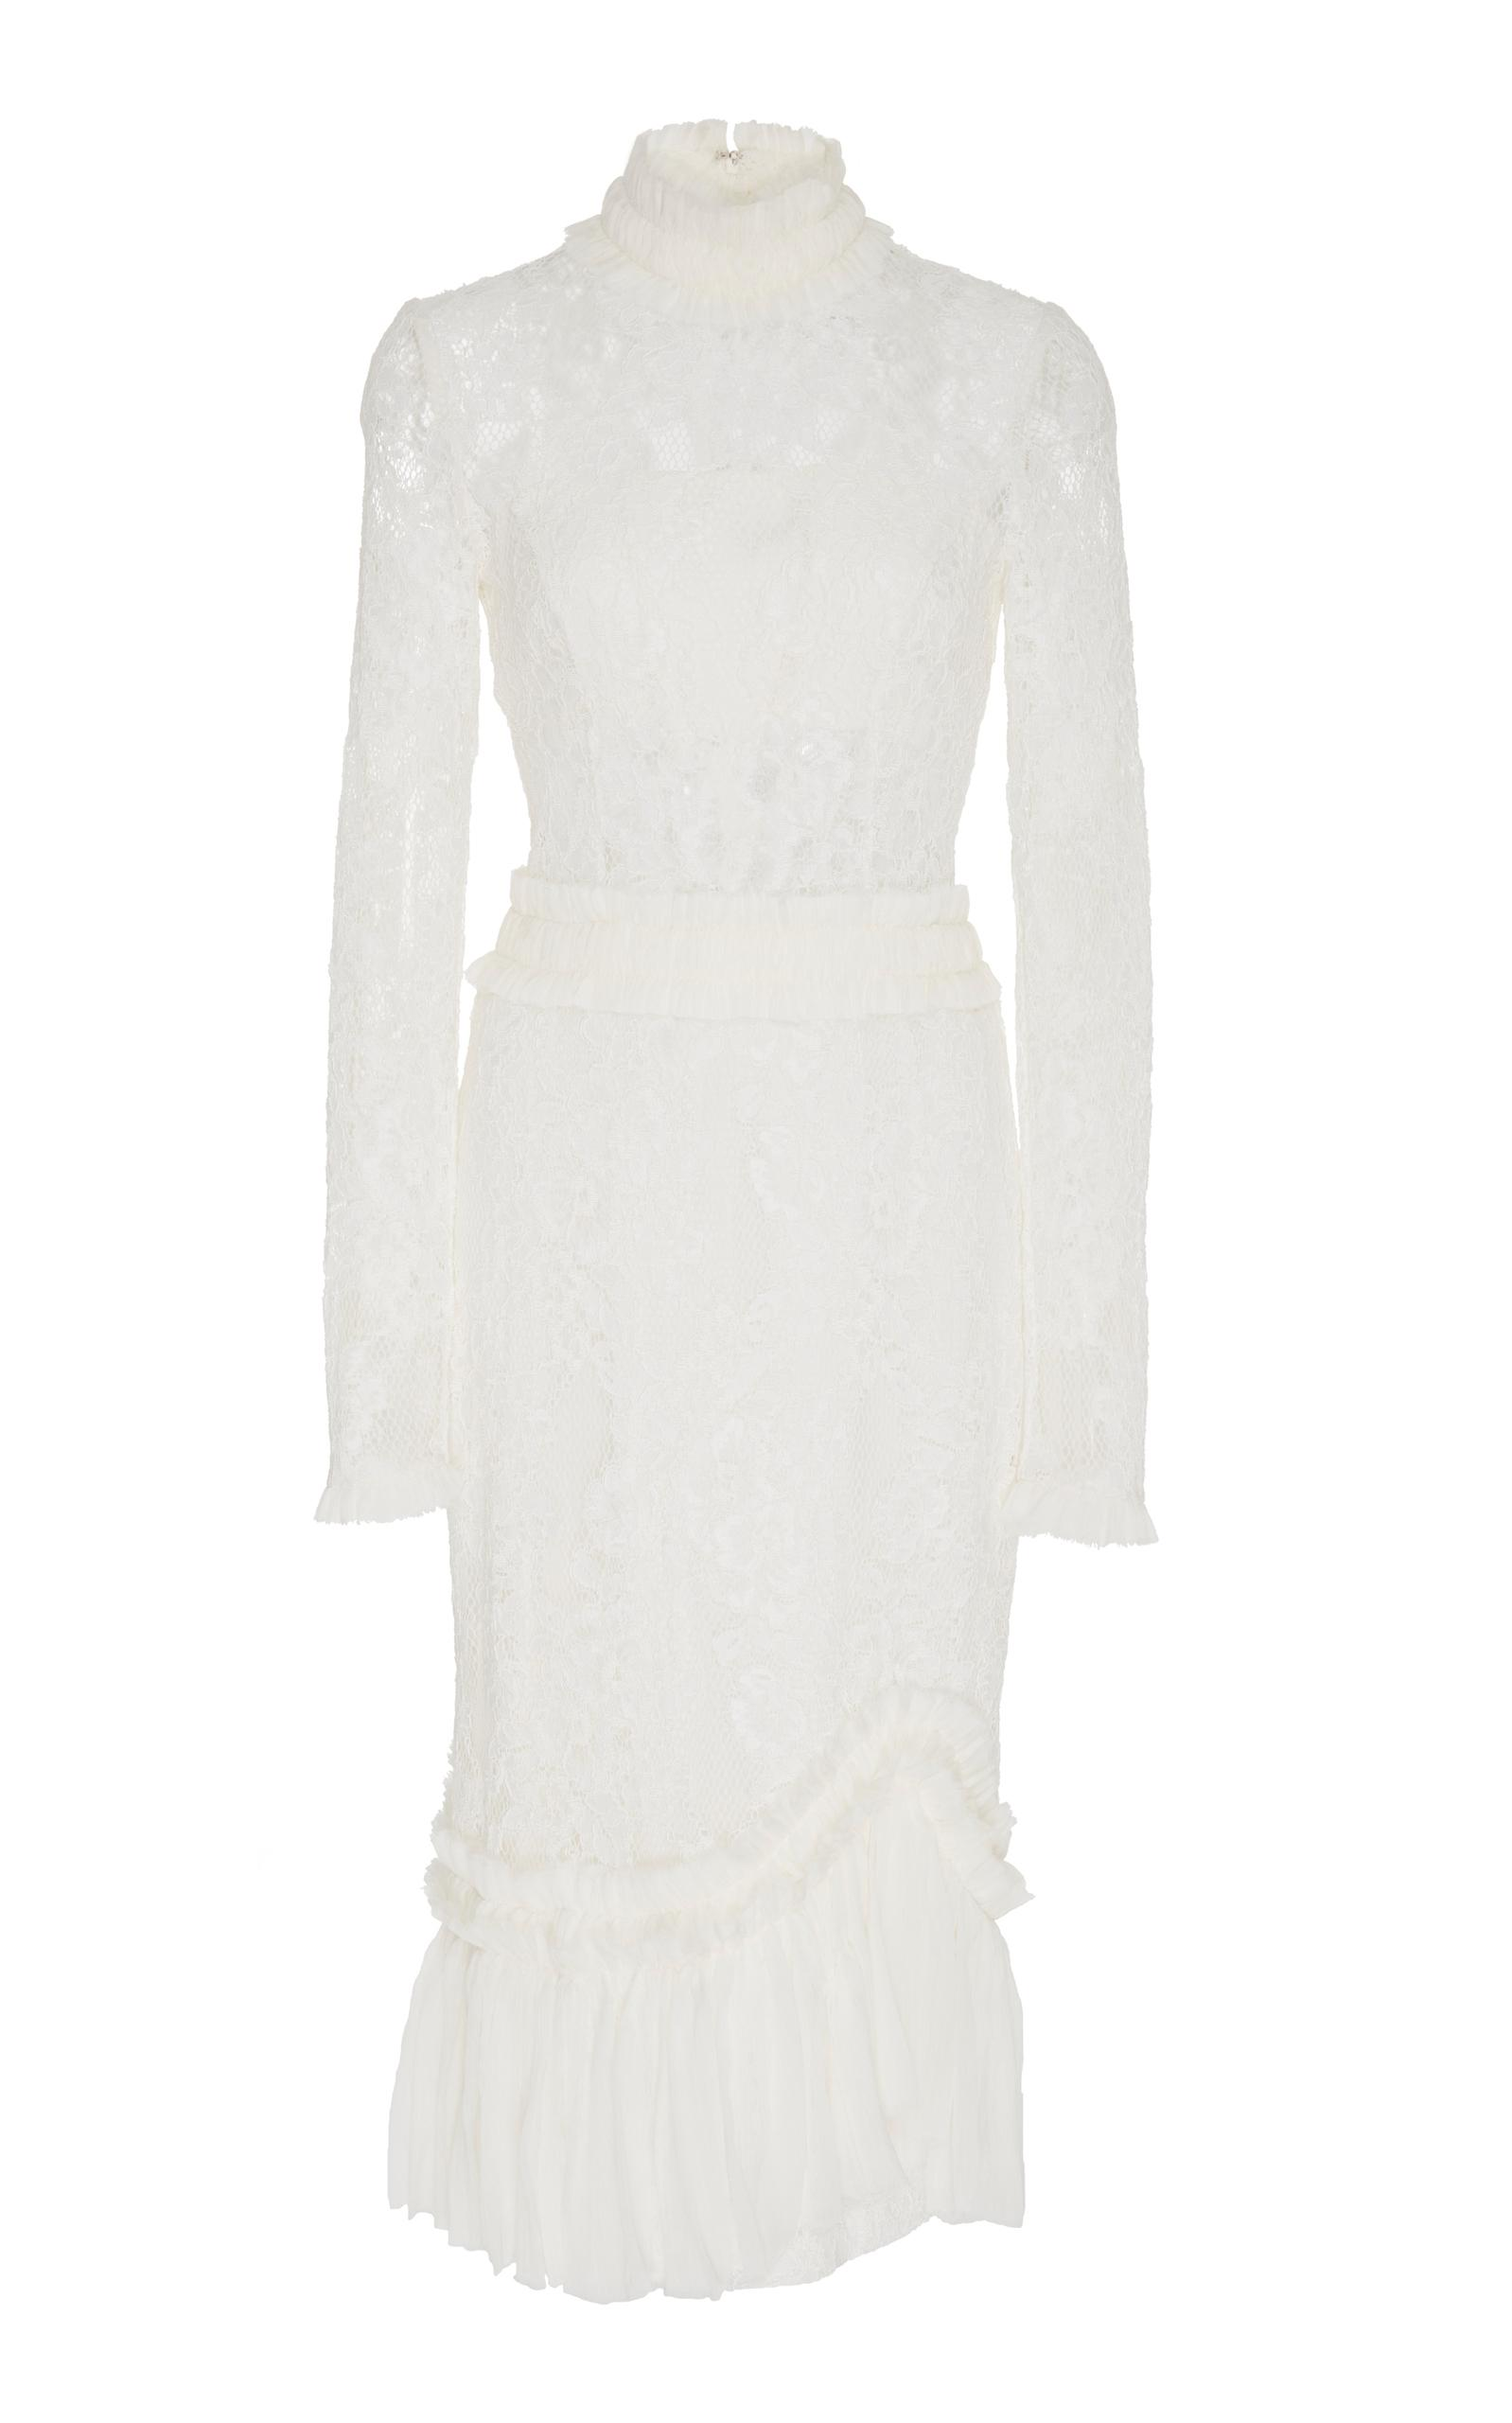 Alexis Anabella Long Sleeve Midi Dress In White